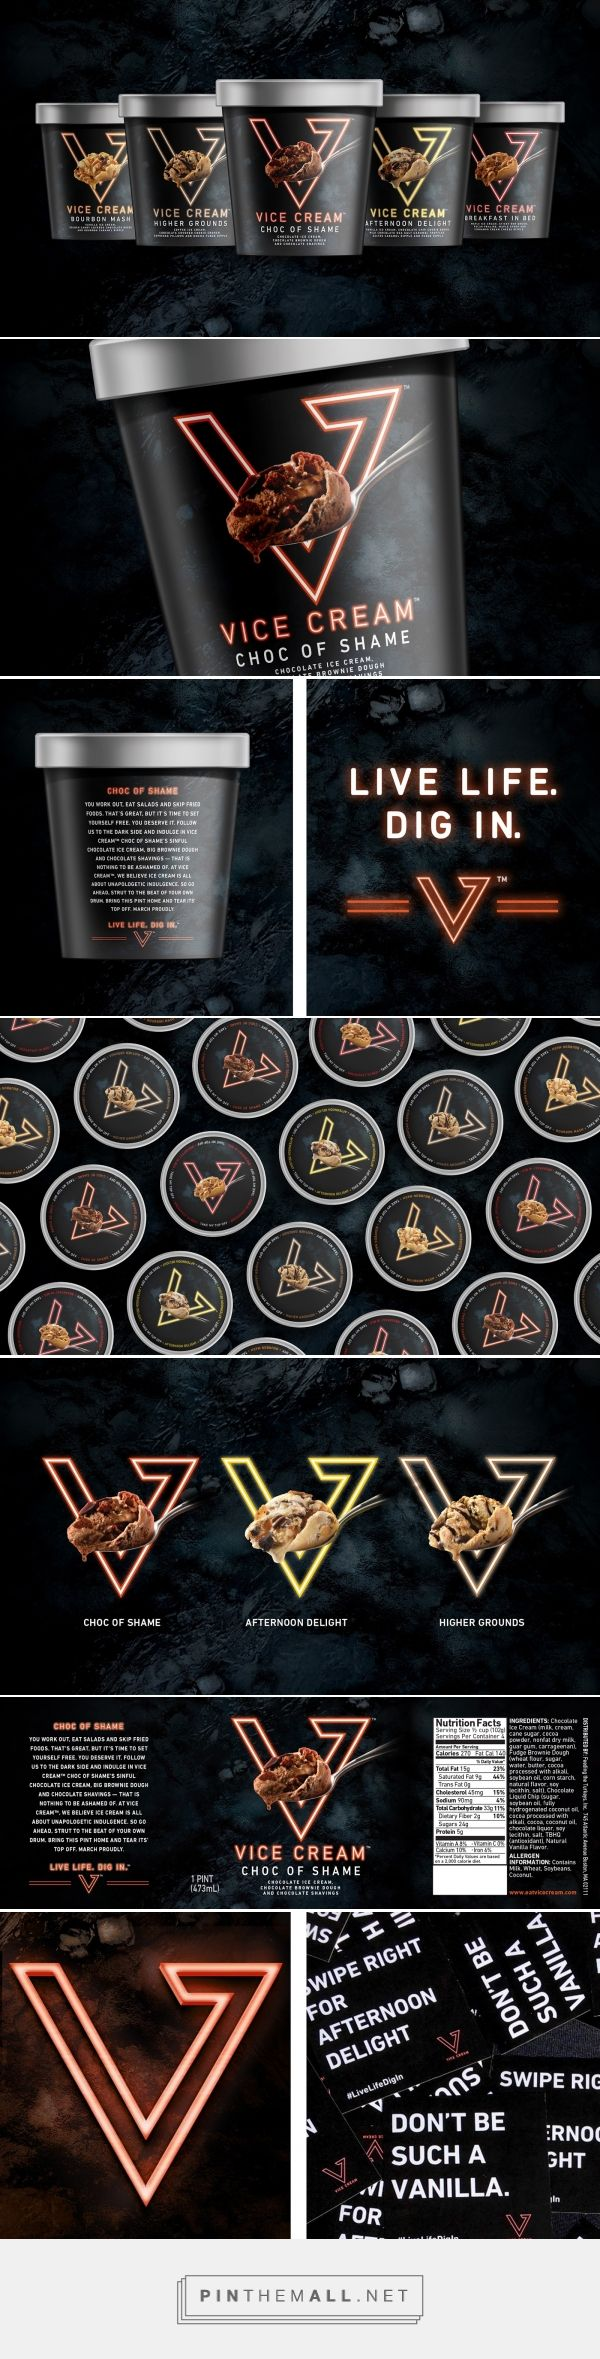 Vice Cream packaging design by Interact Boulder - http://www.packagingoftheworld.com/2016/11/vice-cream.html